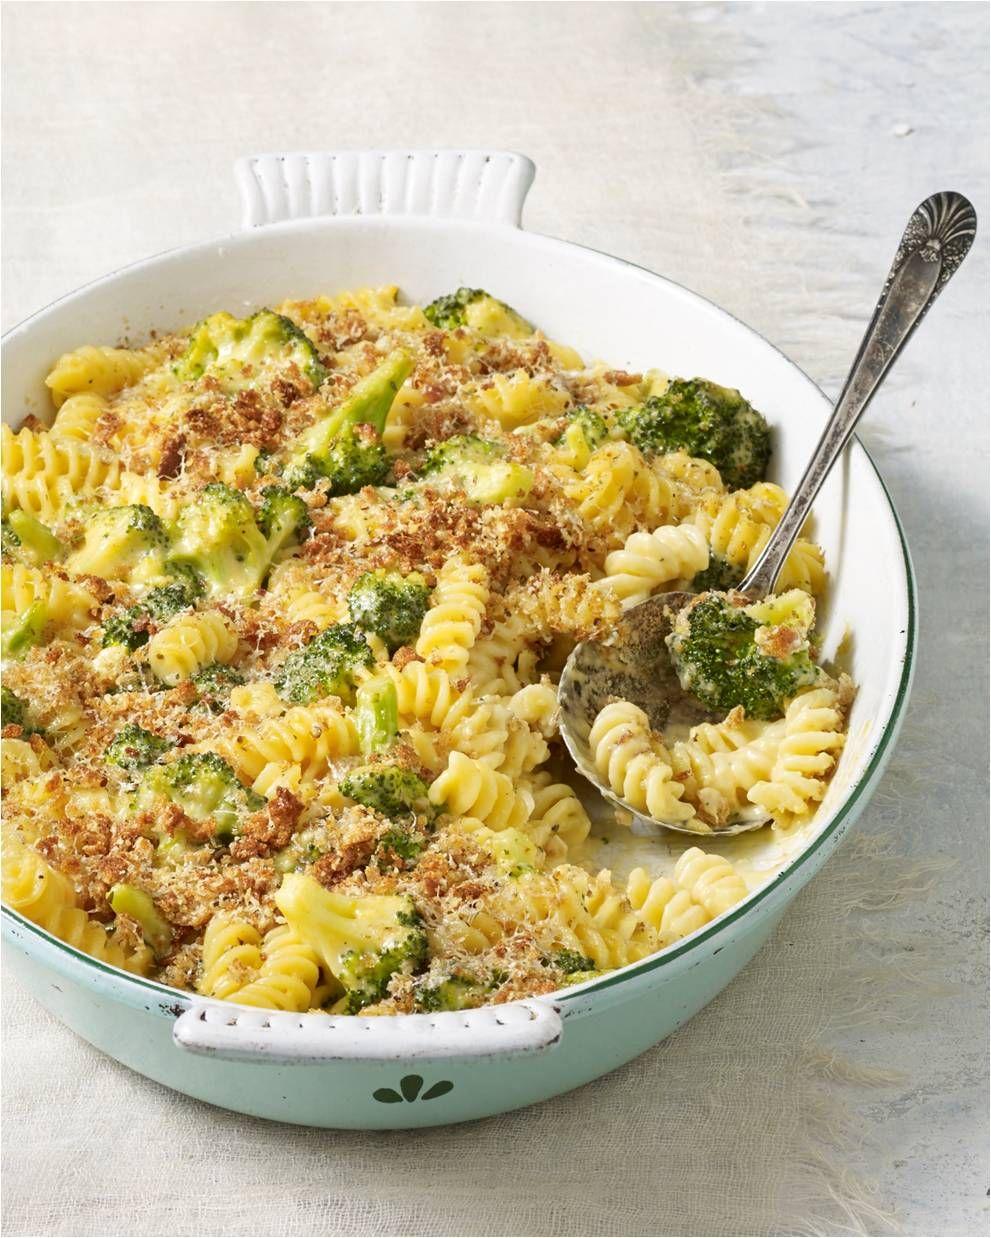 Skinny Broccoli Mac and Cheese